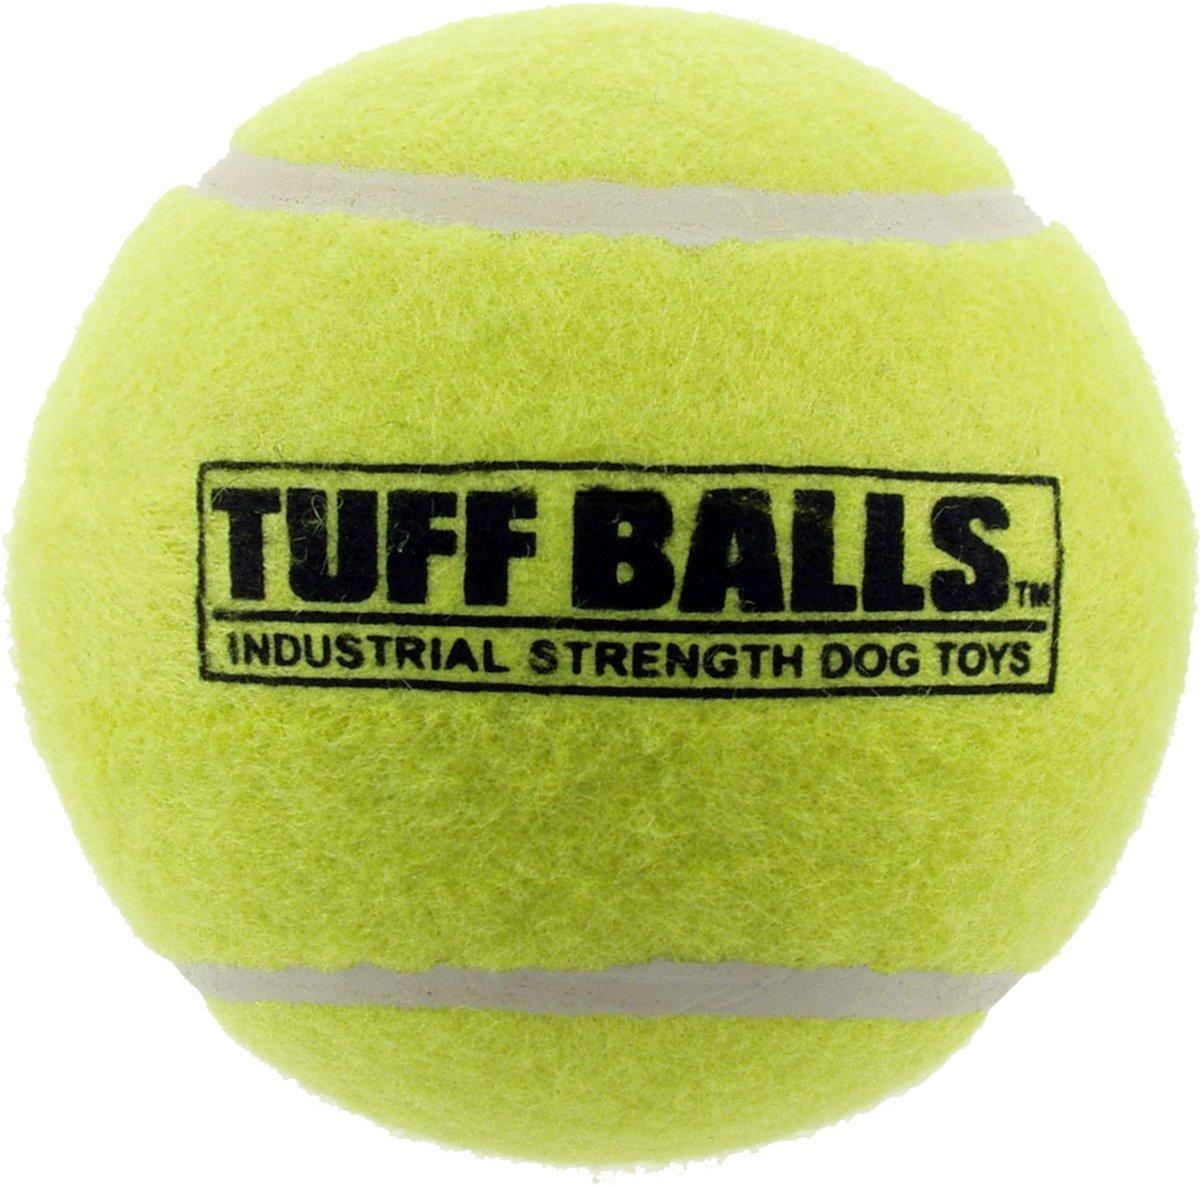 pet supplies big tennis ball petsport large tuff ball inch pet supplies big tennis ball petsport large tuff ball 4 inch com